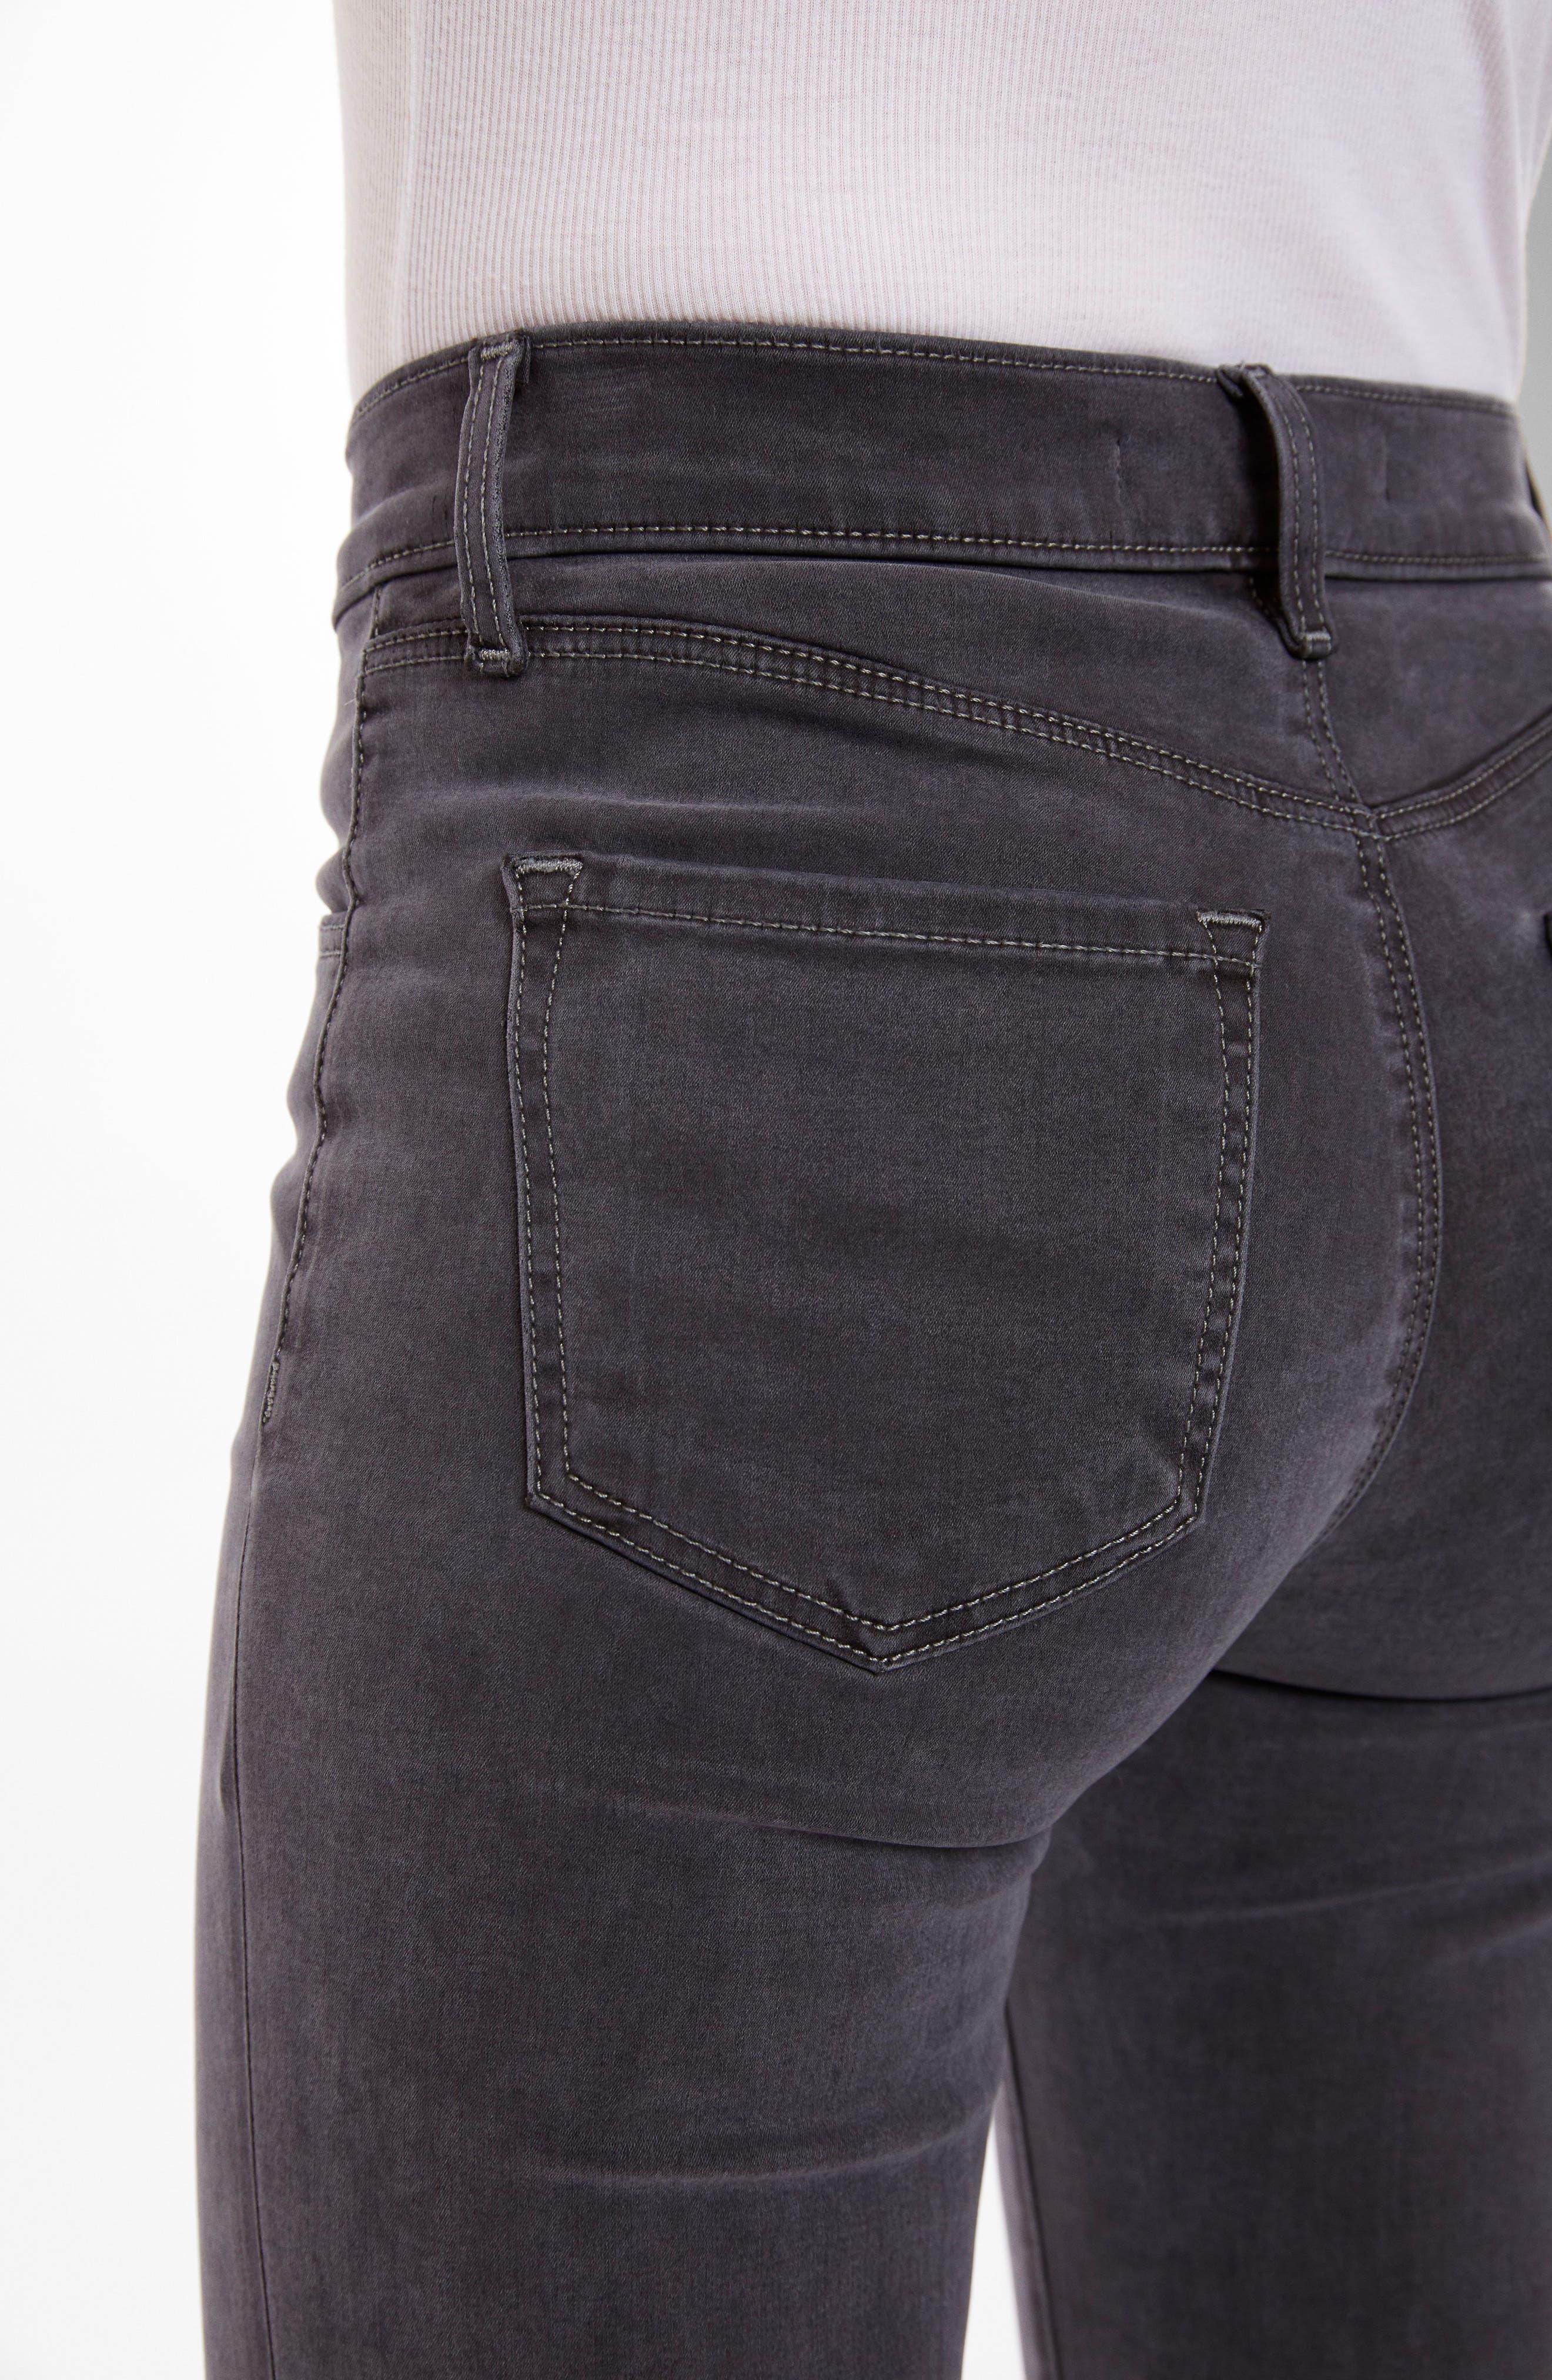 Alana High Waist Crop Skinny Jeans,                             Alternate thumbnail 5, color,